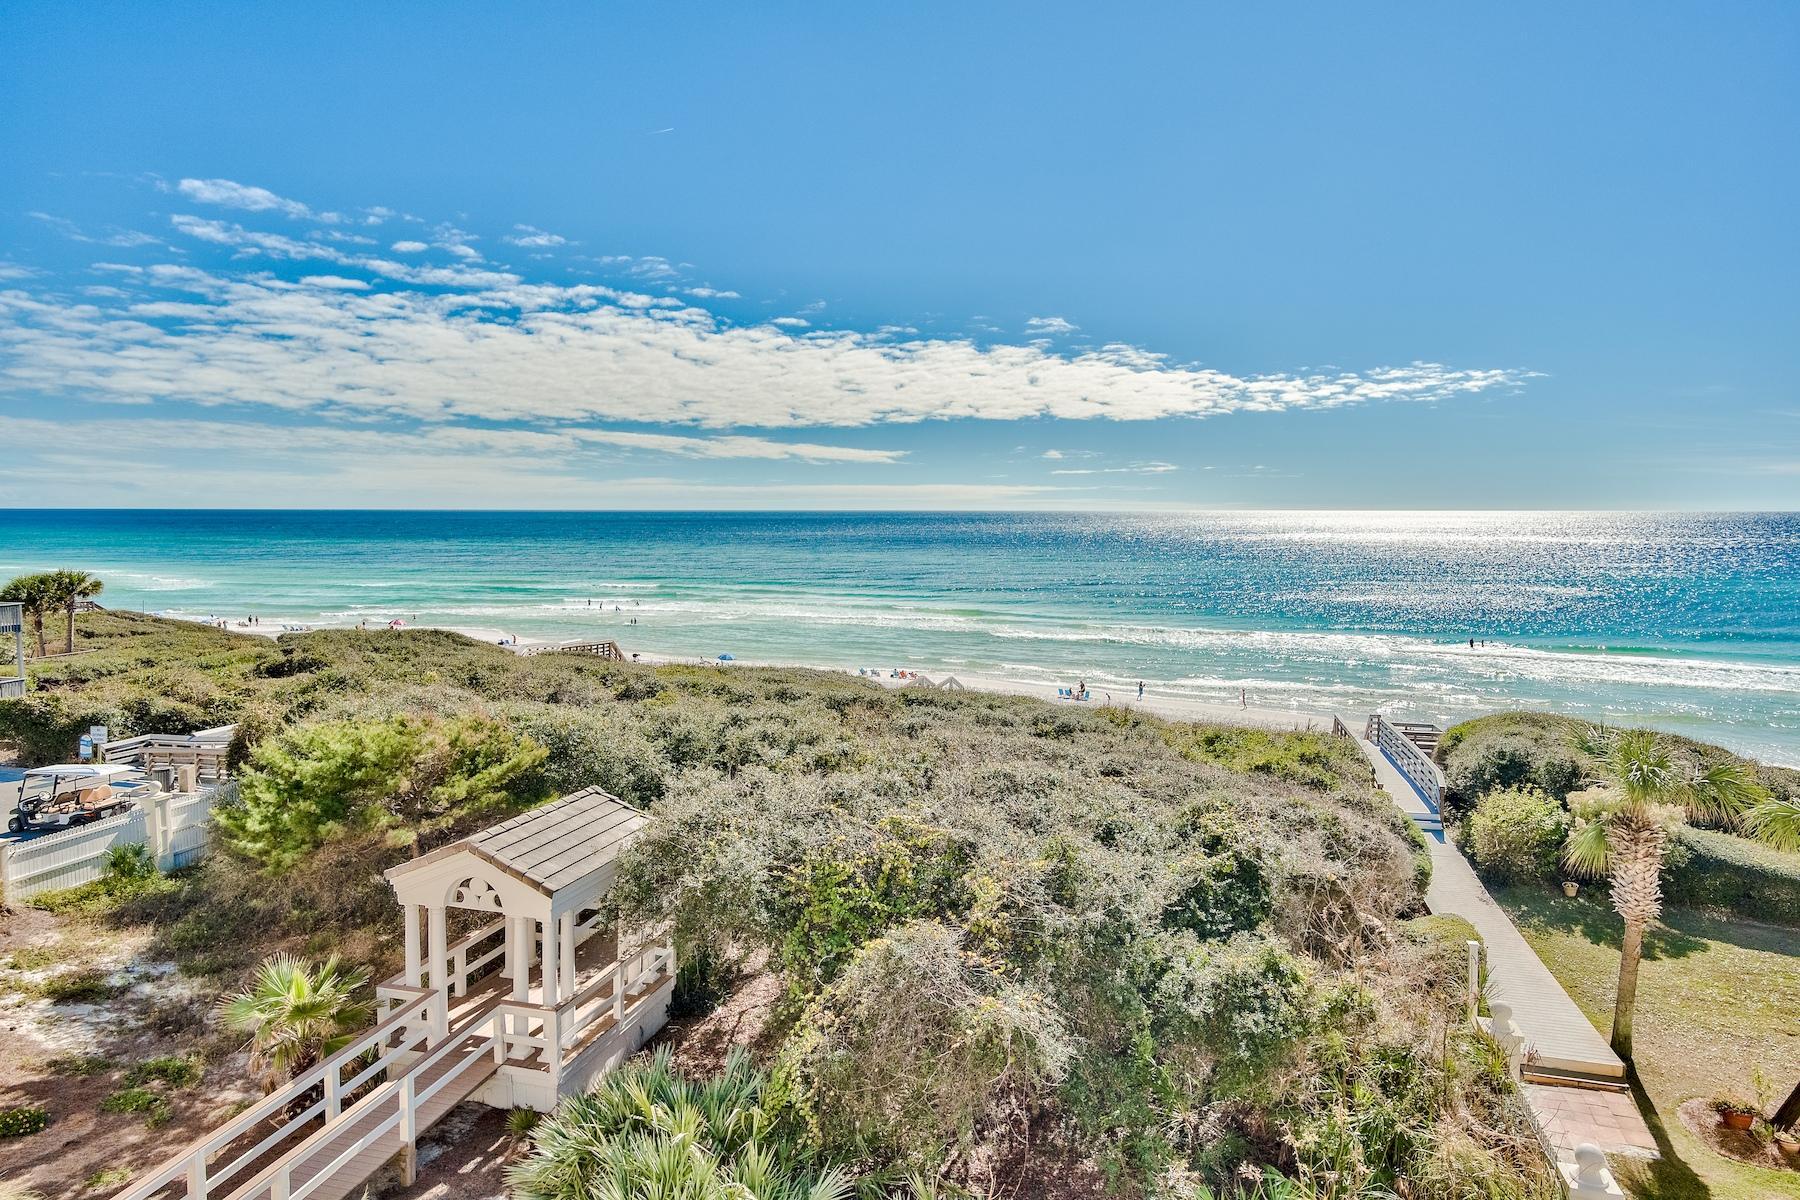 36 San Juan, Santa Rosa Beach, 4 Bedrooms Bedrooms, ,3 BathroomsBathrooms,Detached single family,For Sale,San Juan,859817